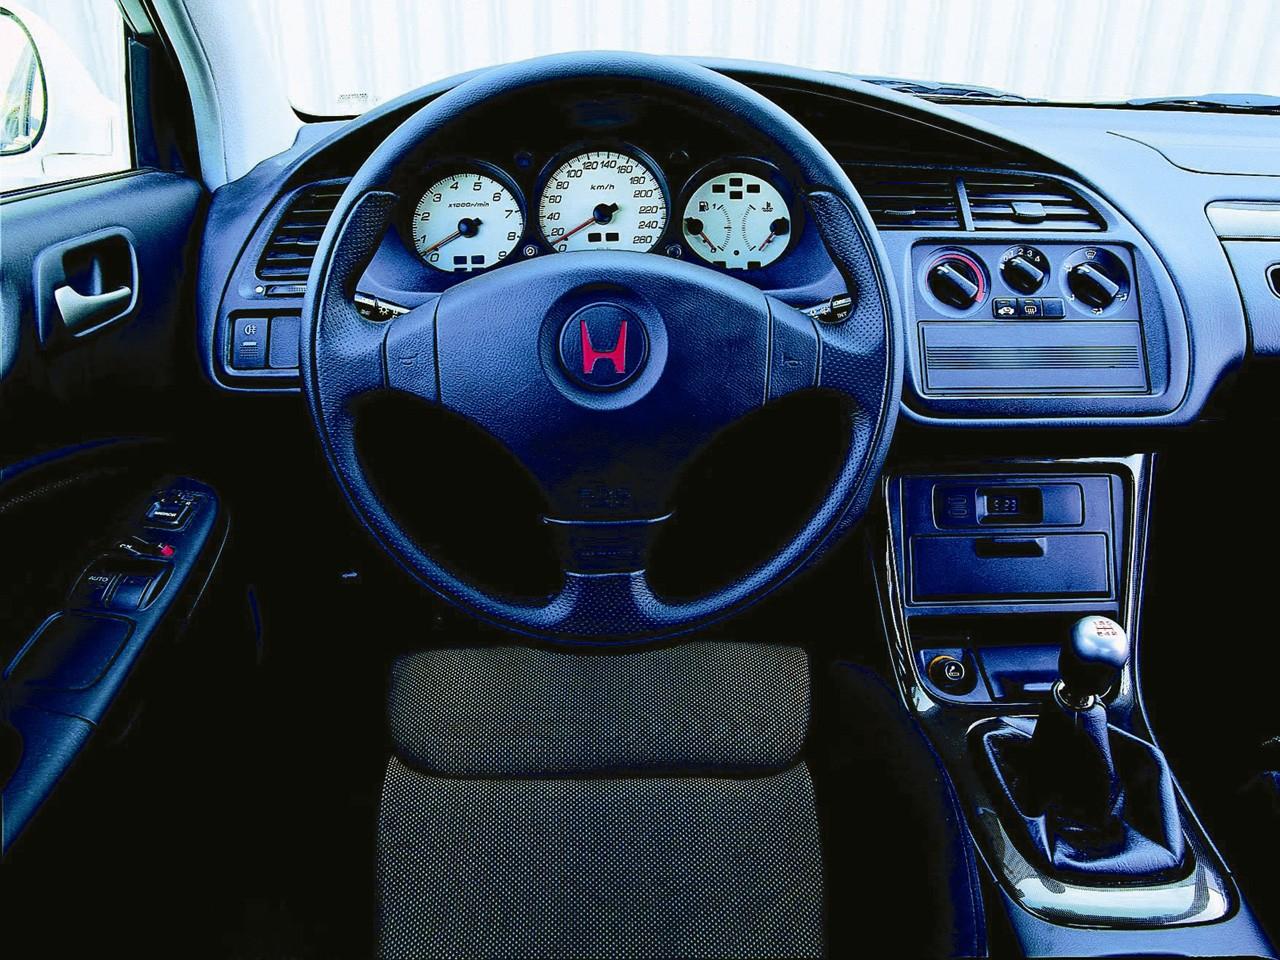 Bmw 2002 For Sale >> HONDA Accord Type R - 1998, 1999, 2000, 2001, 2002, 2003, 2004, 2005 - autoevolution